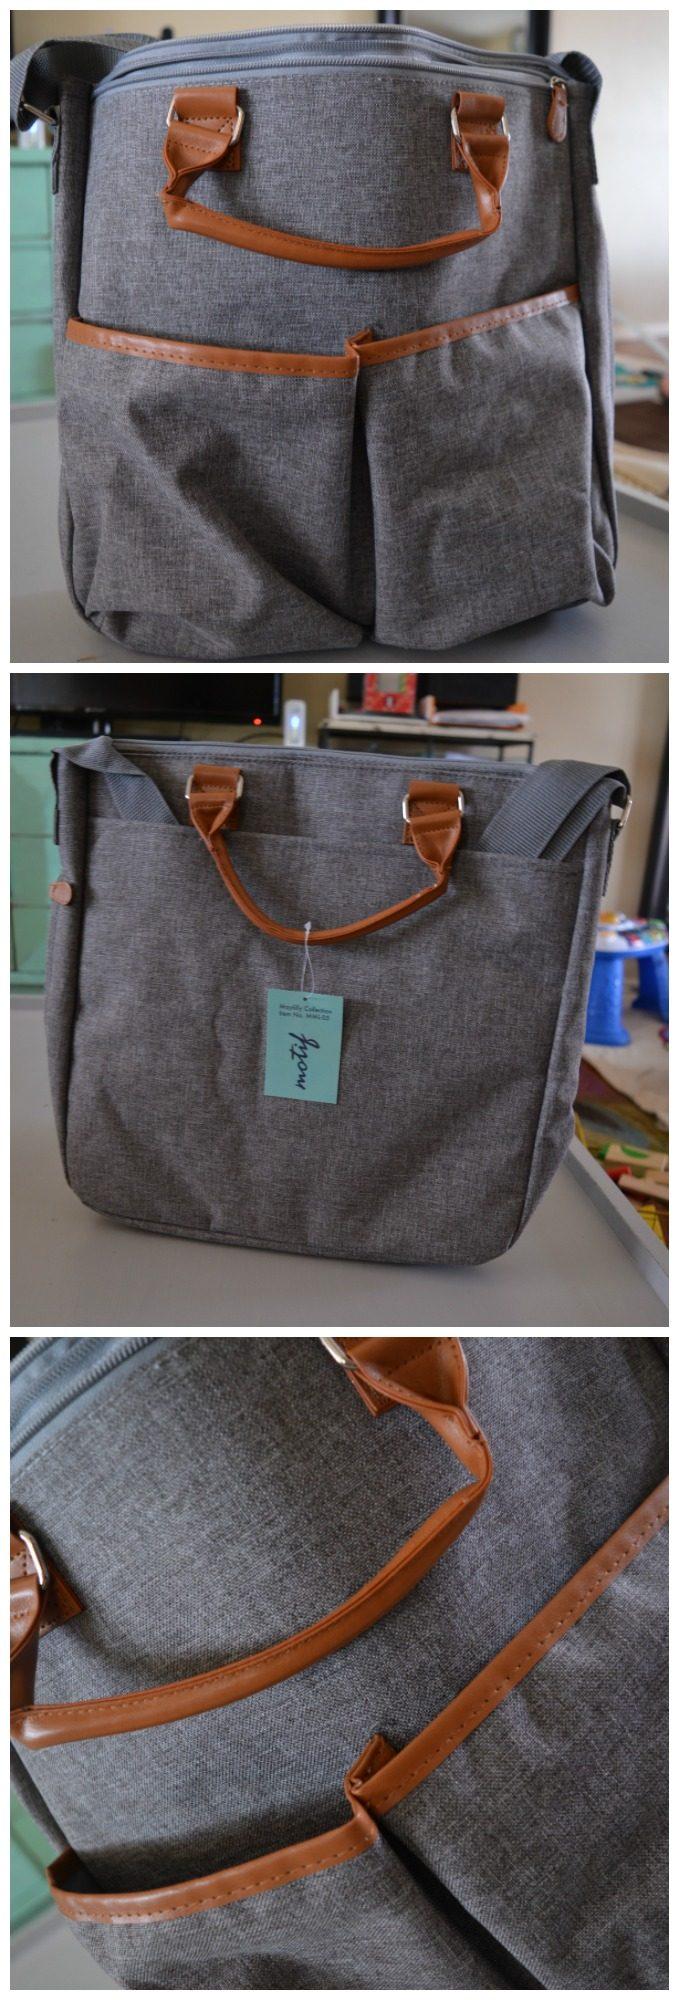 Motif Maylilly Electric Breast Pump Tote Bag Grey